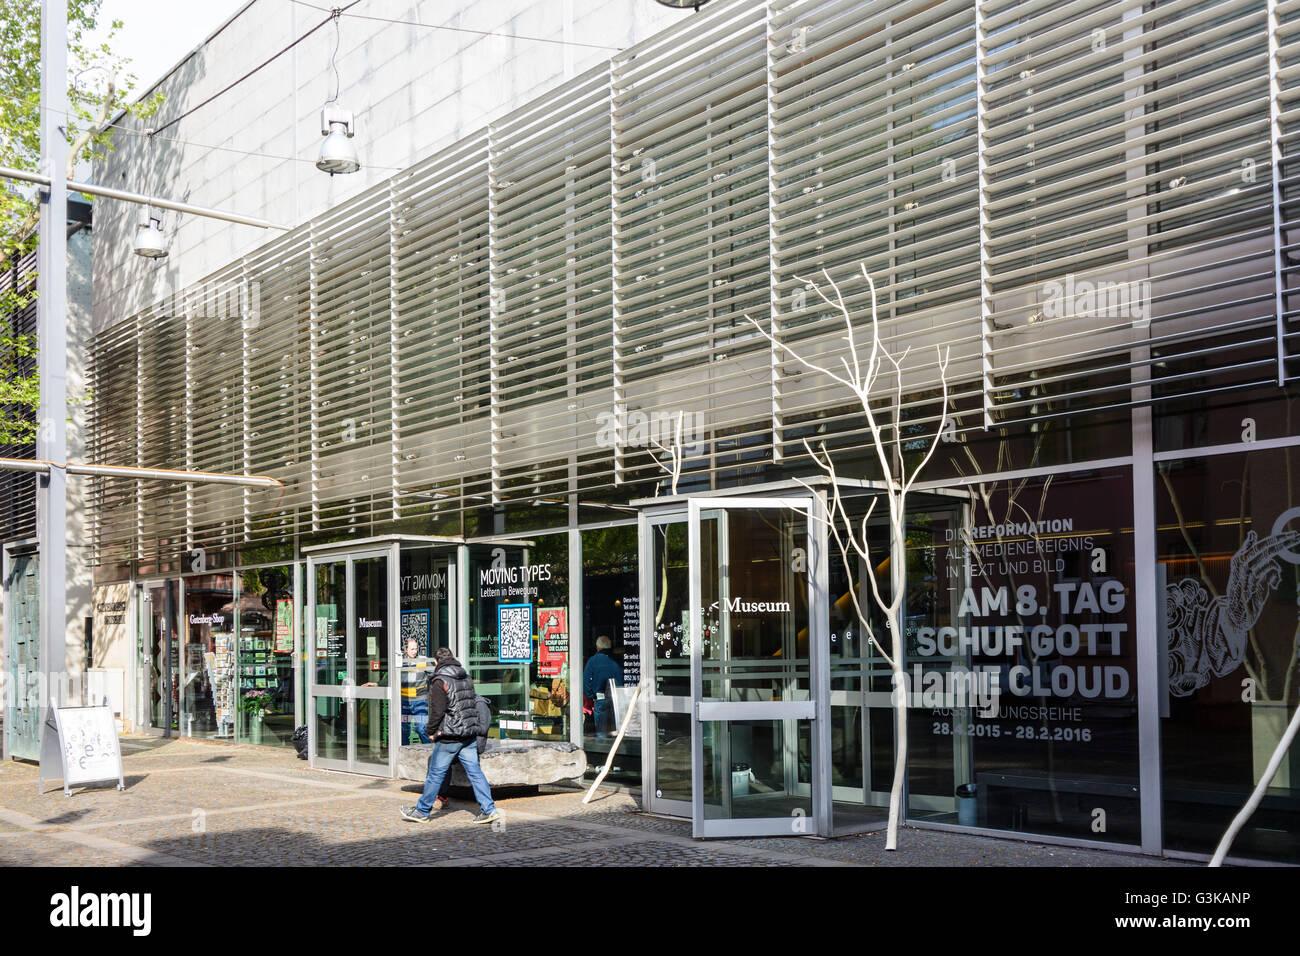 Gutenberg Museum, Germany, Rheinland-Pfalz, Rhineland-Palatinate, , Mainz - Stock Image